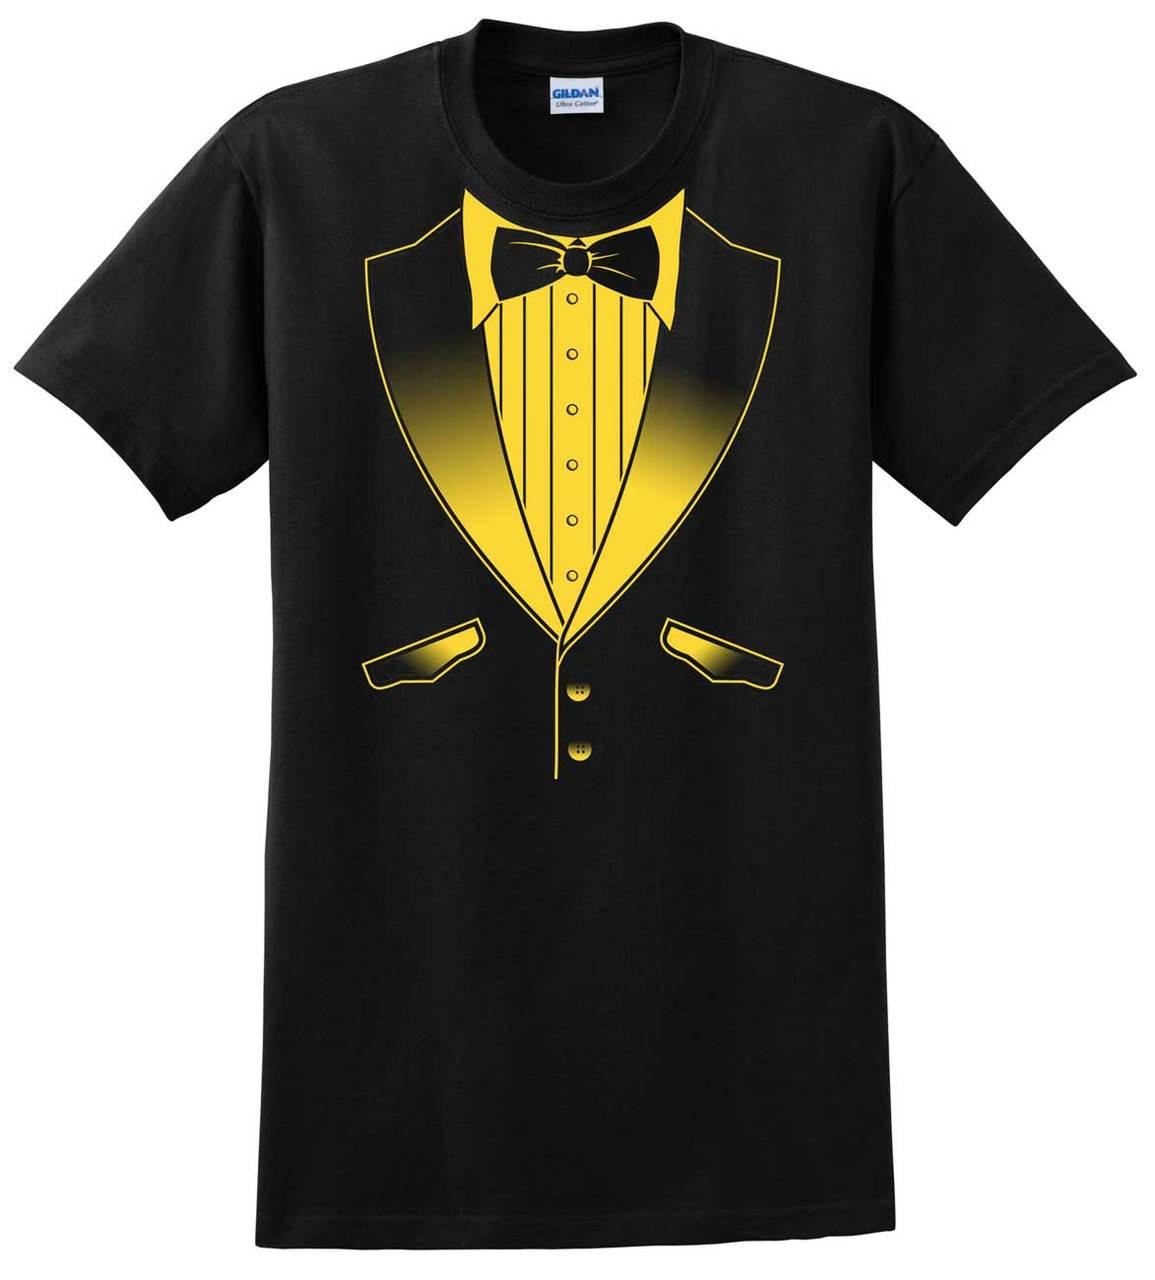 Tuxedo T Shirt In School Colors Black And Gold Tuxedo T Shirts